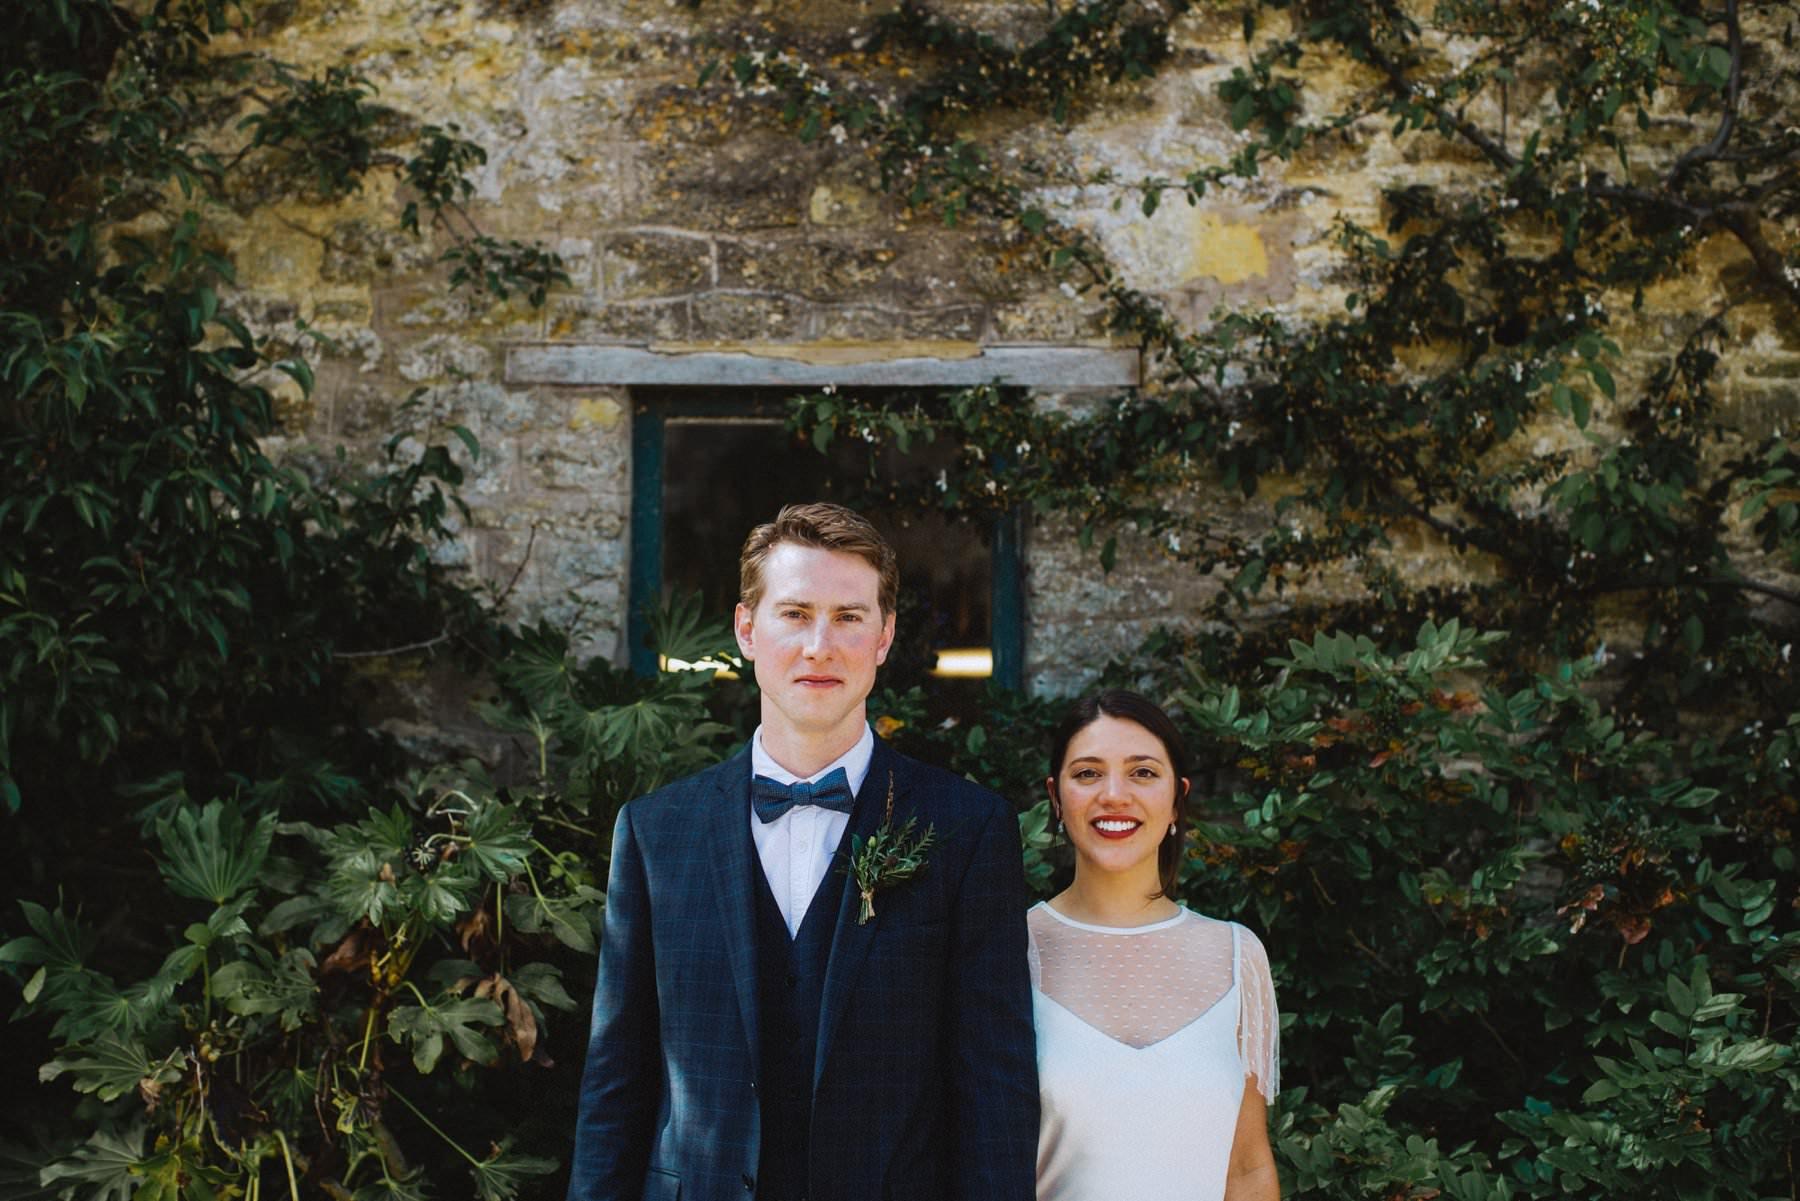 bath wedding photography portraits